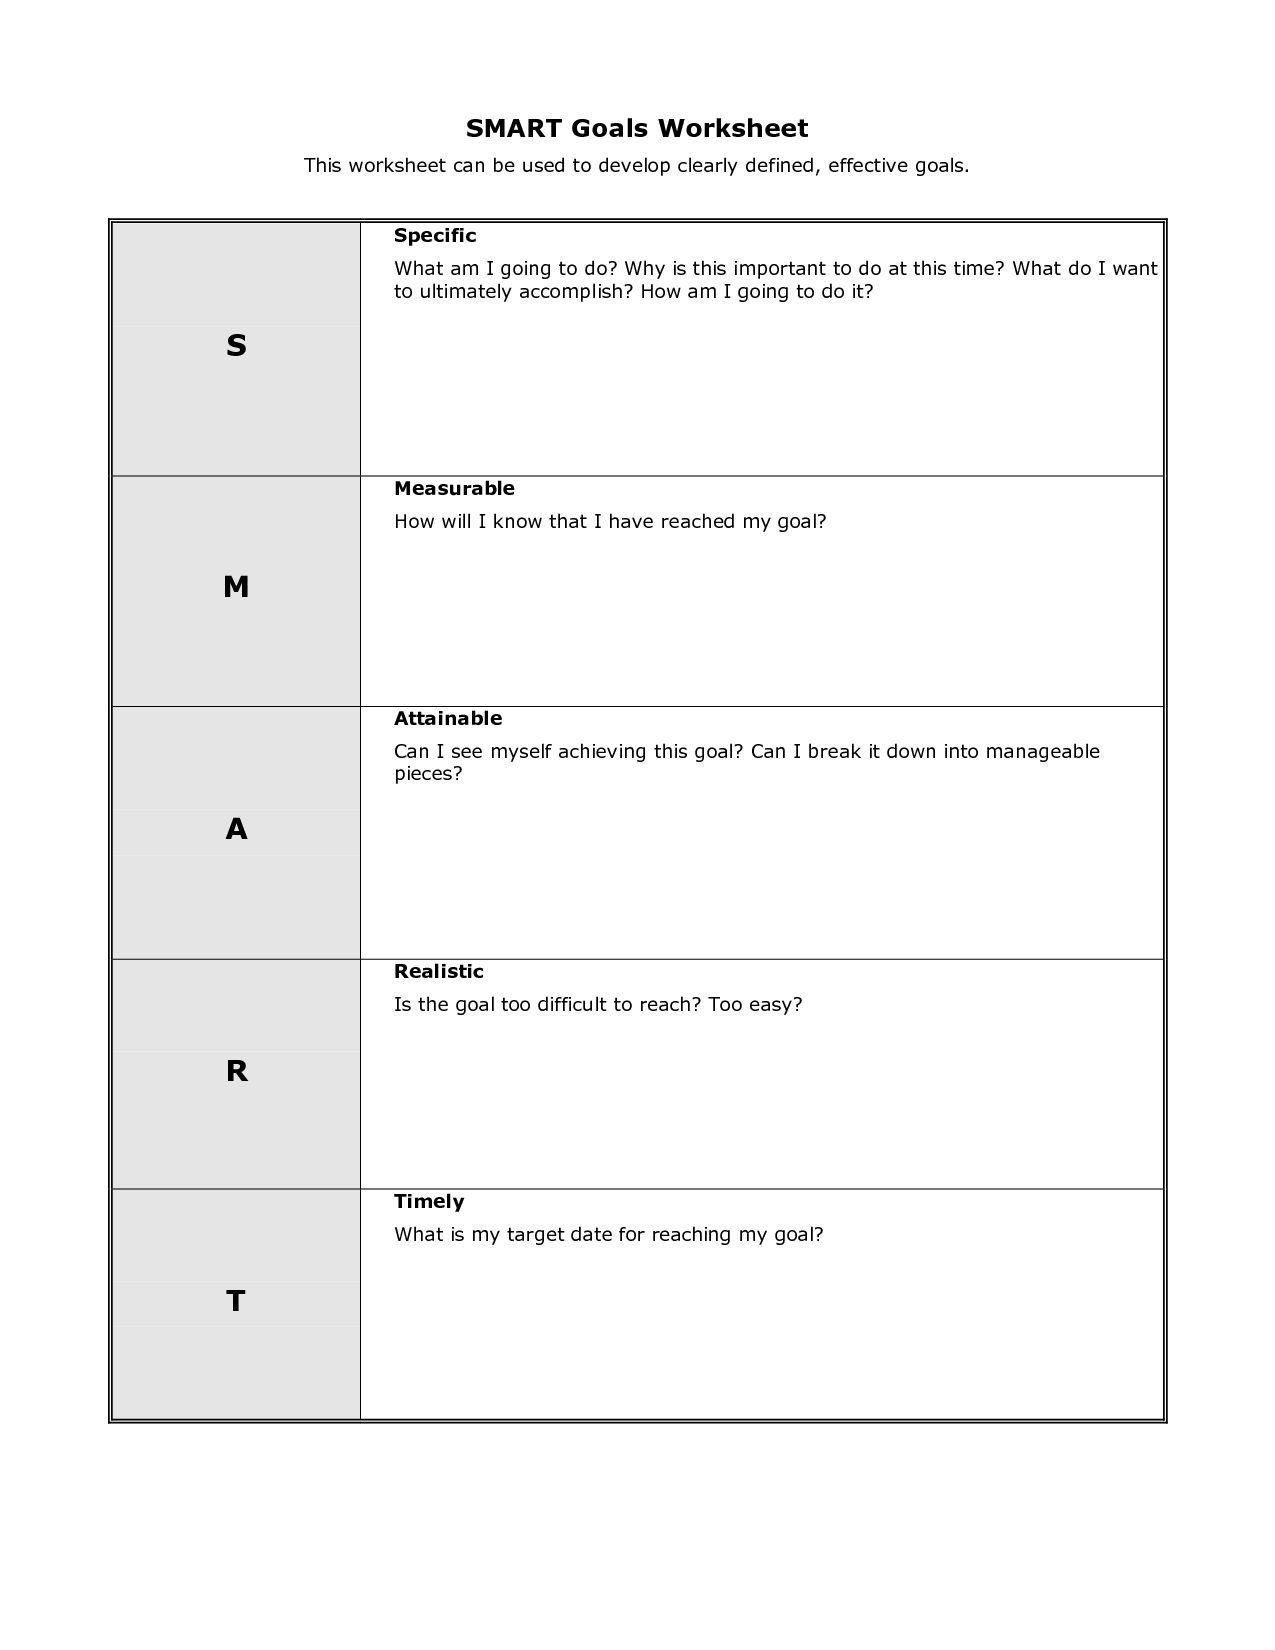 Goal Setting Worksheet For High School Students Pdf in